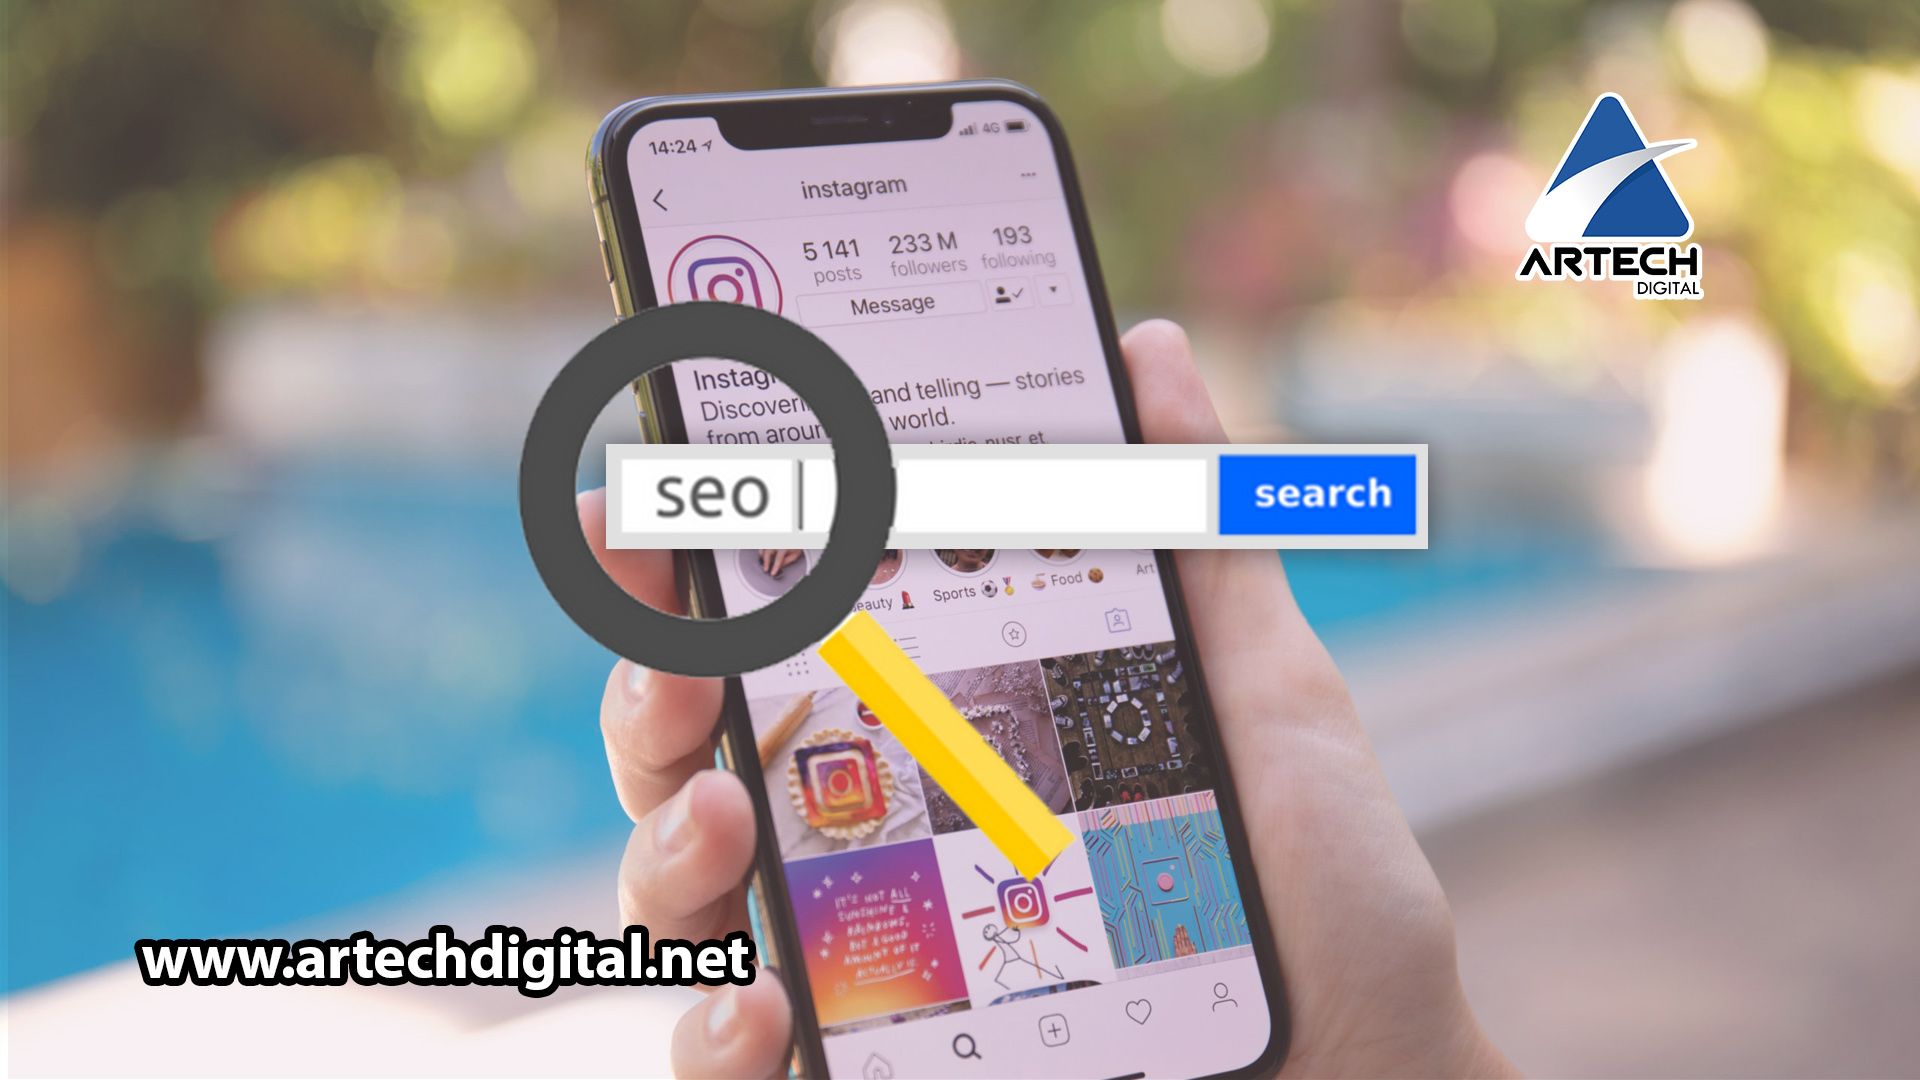 Instagram's keyword search - Artech Digital